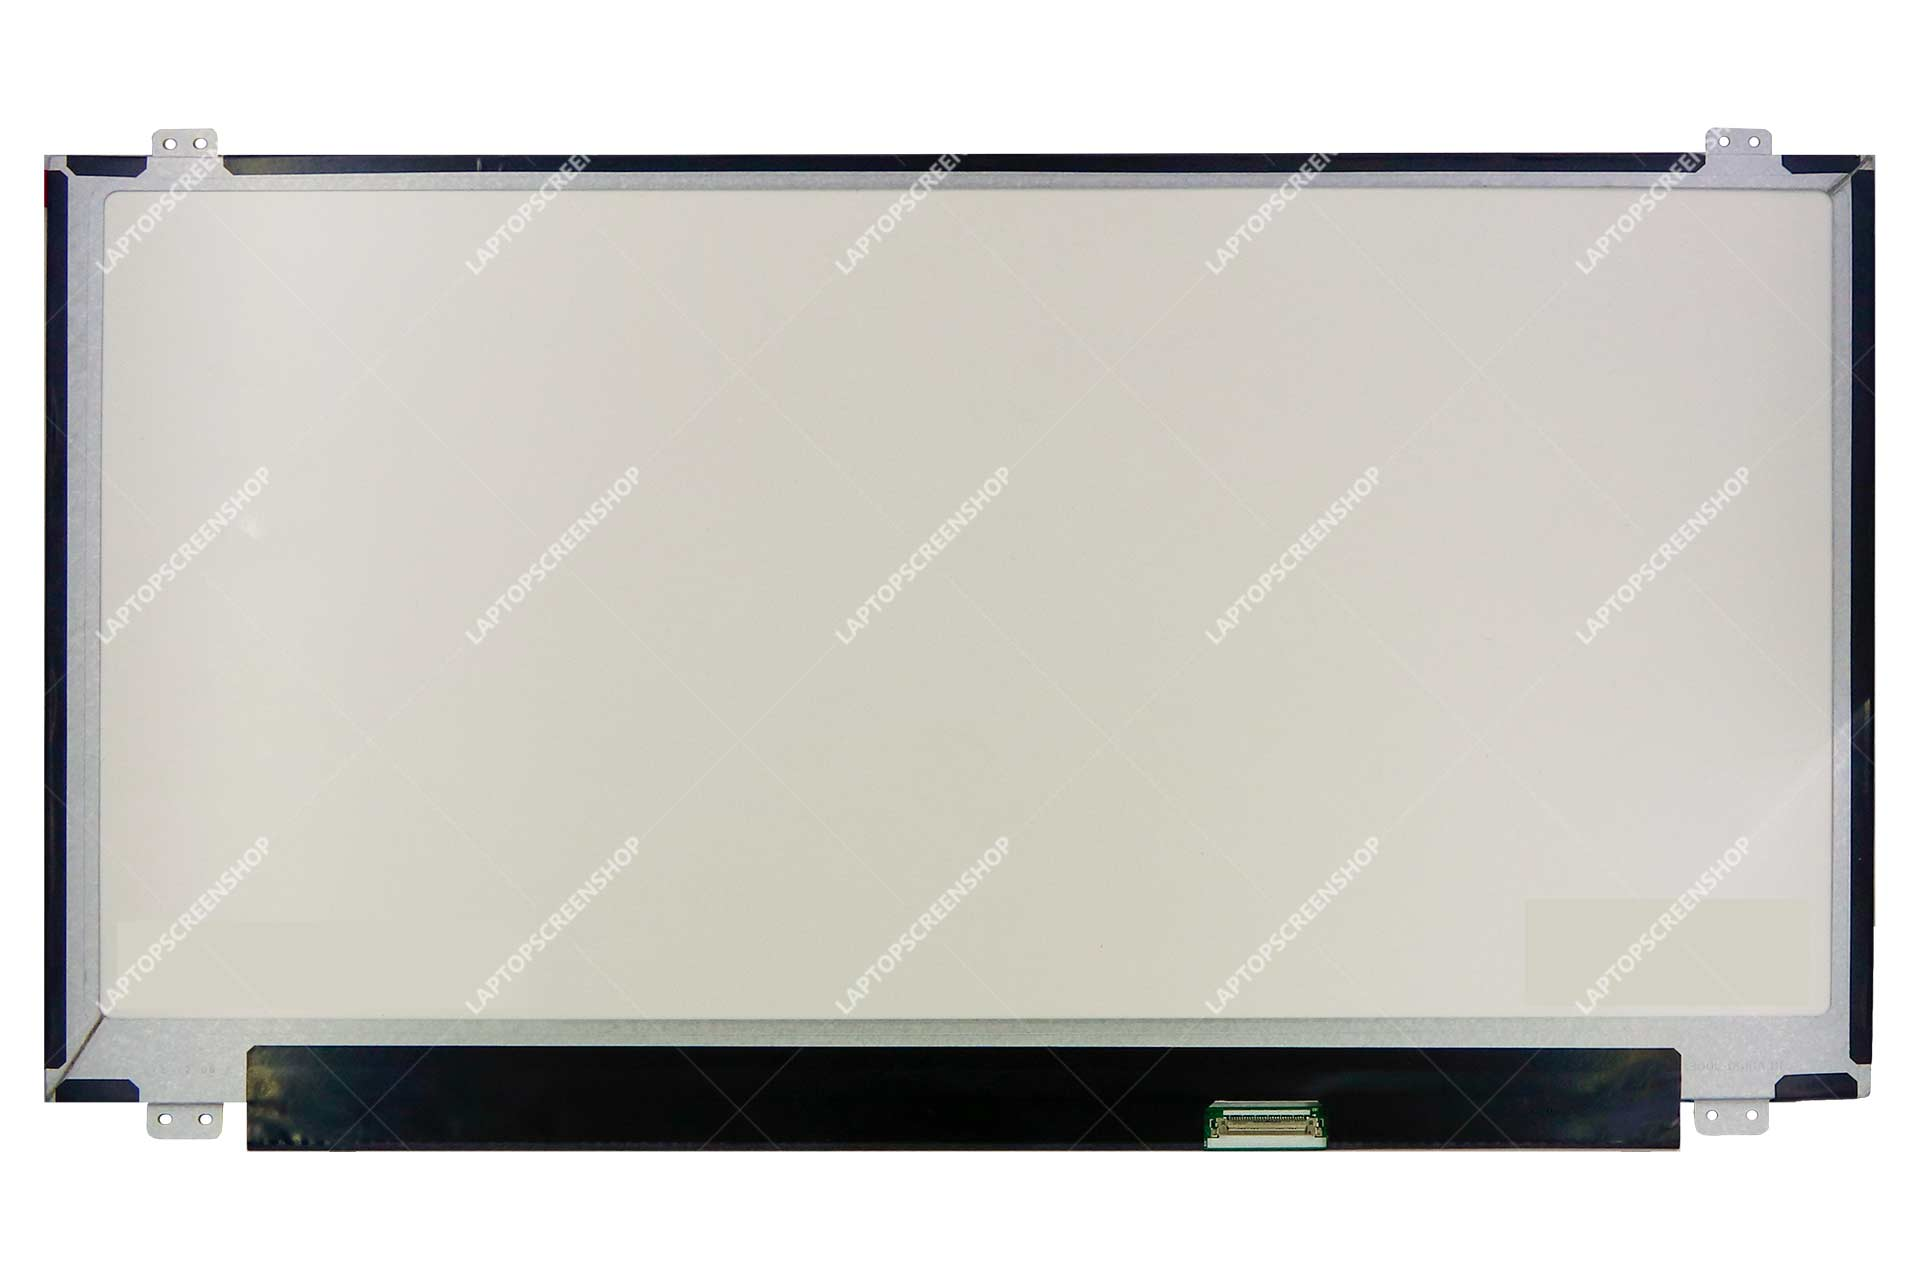 ACER-ASPIRE-E1-430G-SERIES-LCD-LCD  HD فروشگاه لپ تاپ اسکرين   تعمير لپ تاپ